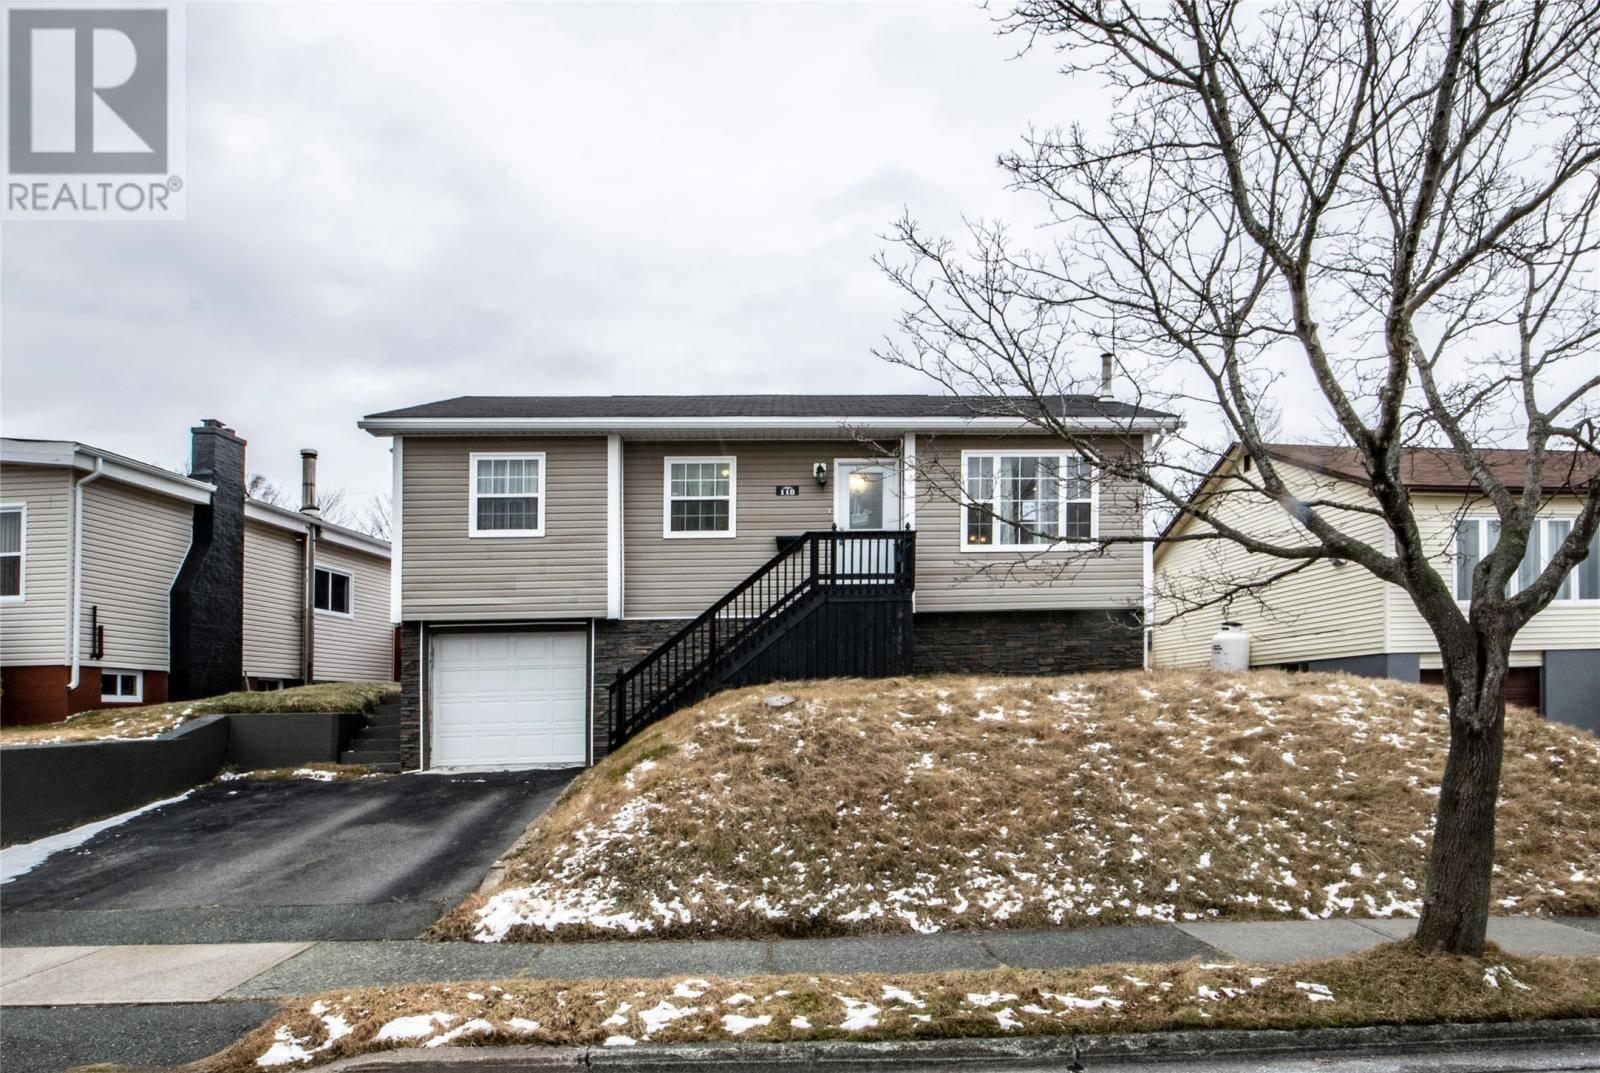 House for sale at 118 Ennis Ave St John's Newfoundland - MLS: 1209085